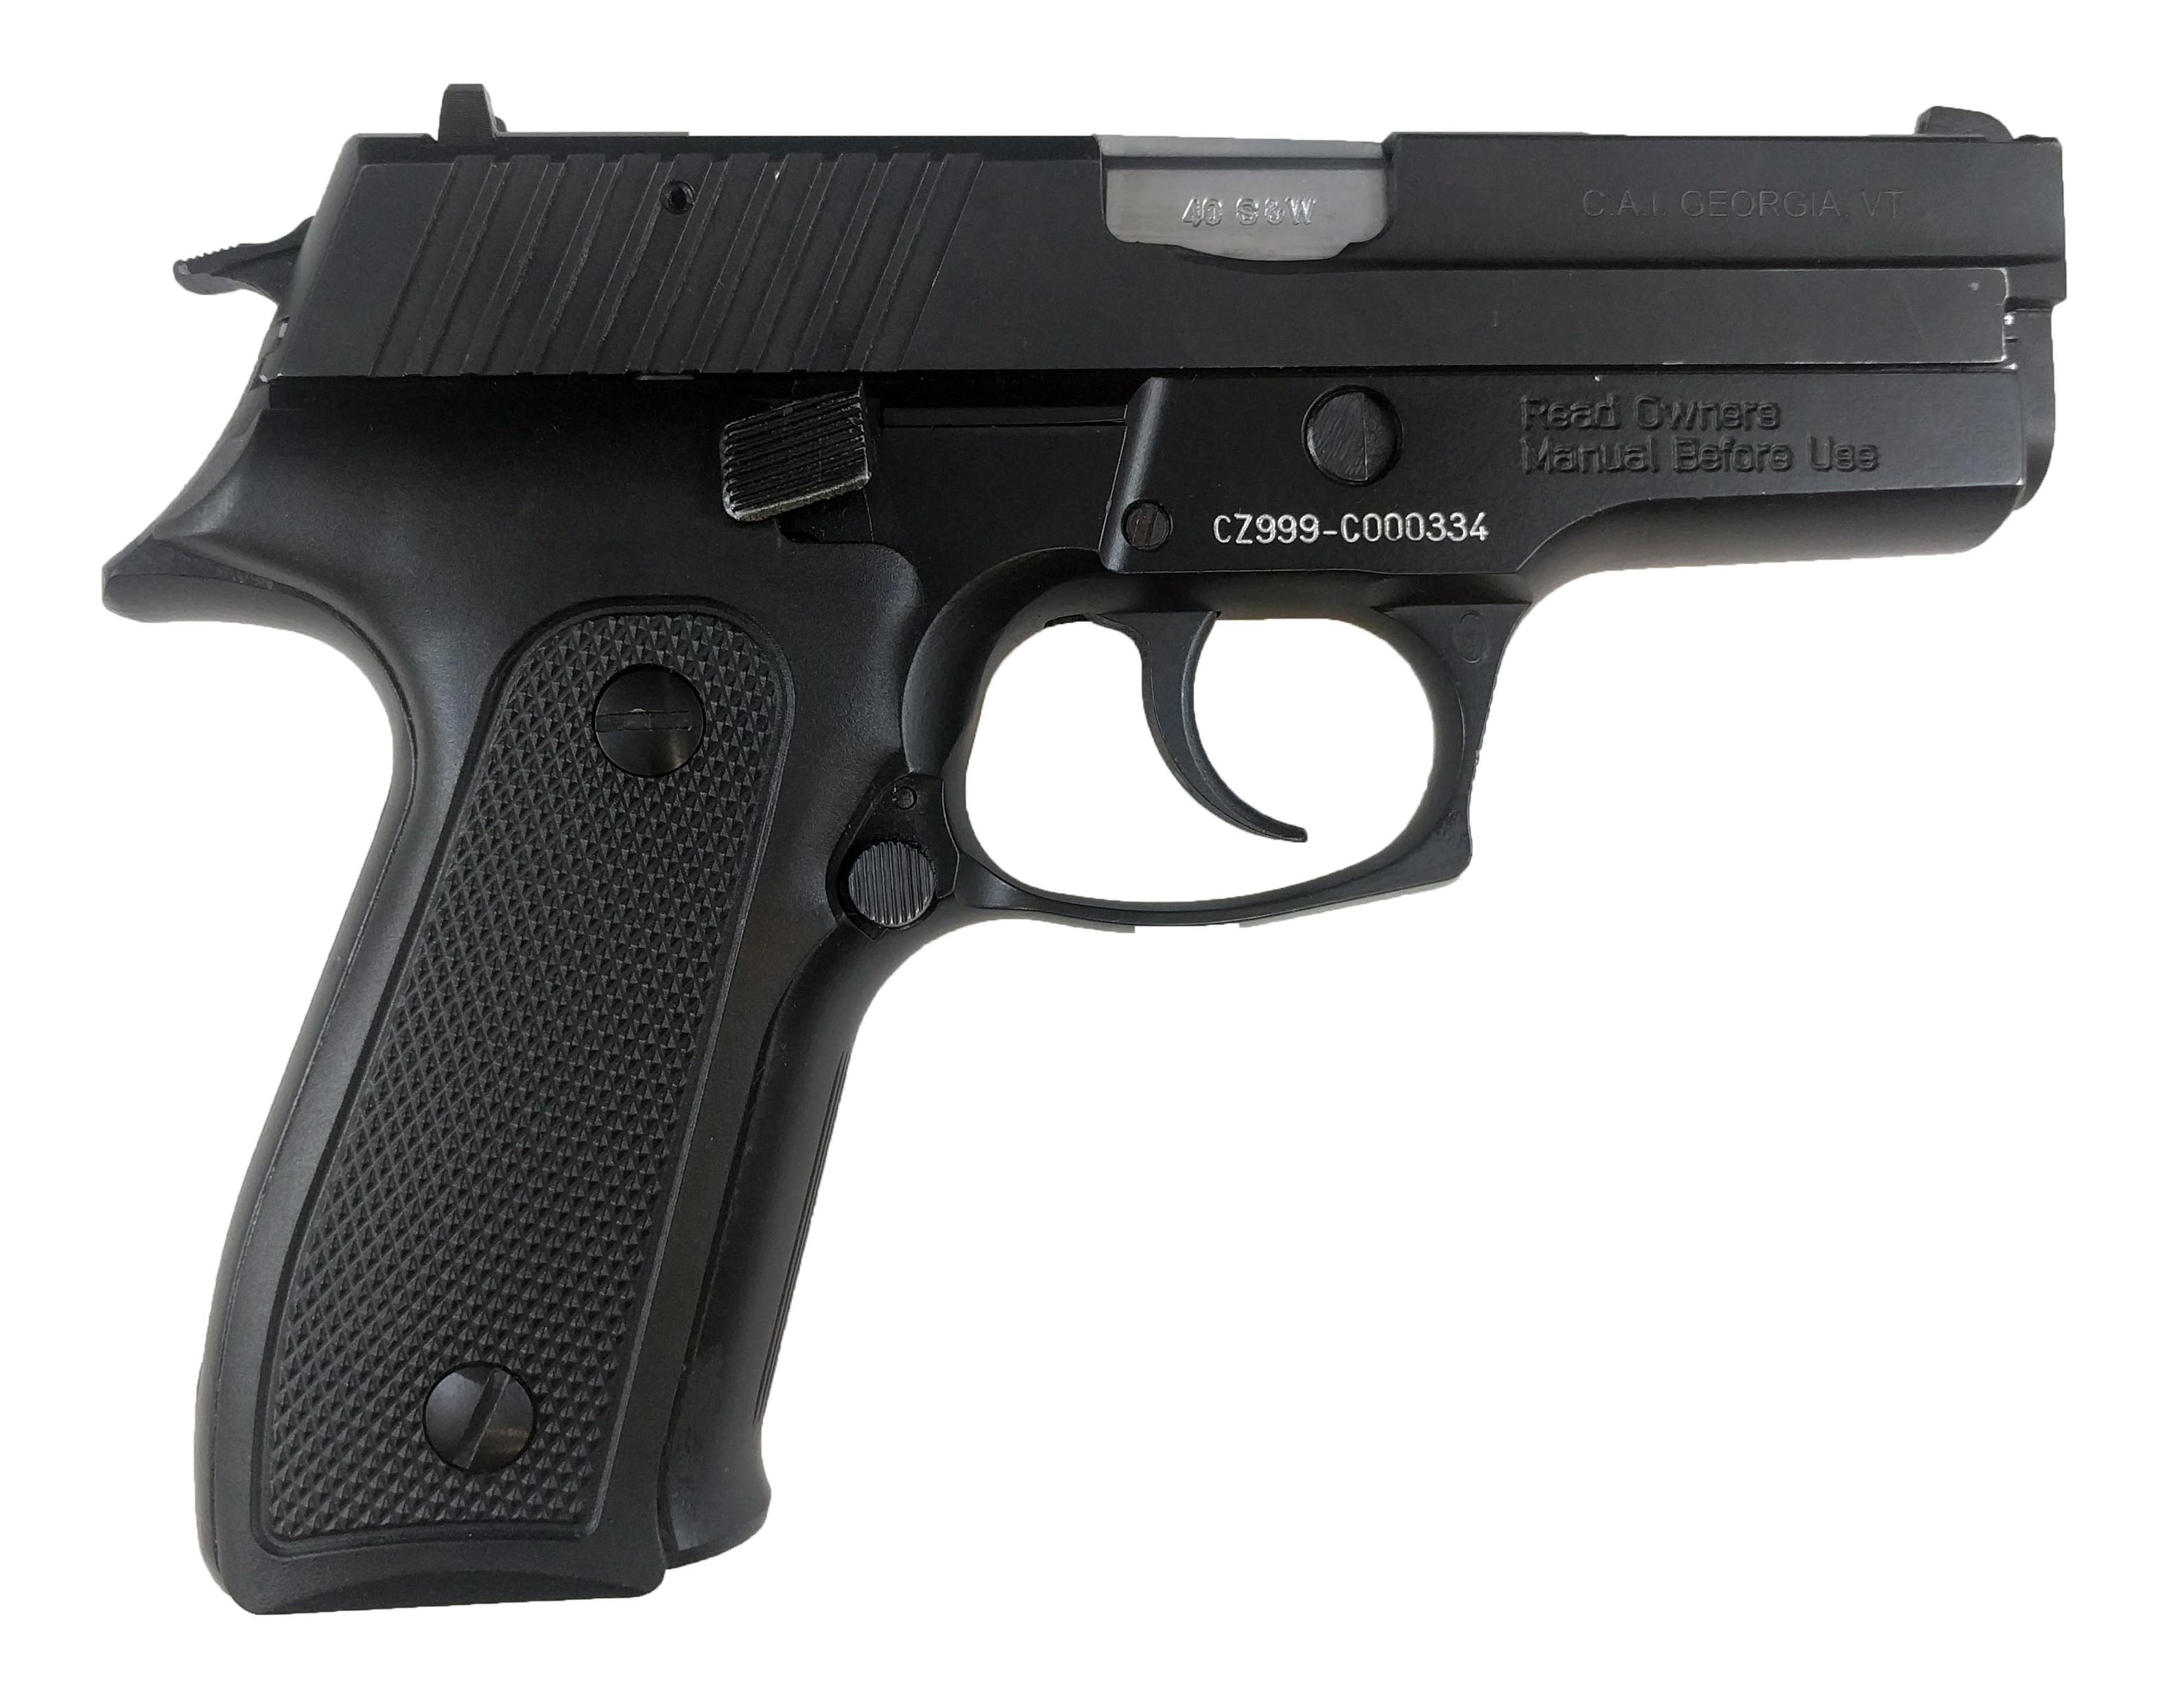 Zastava CZ999 Compact, 9mm, *Good, Incomplete*